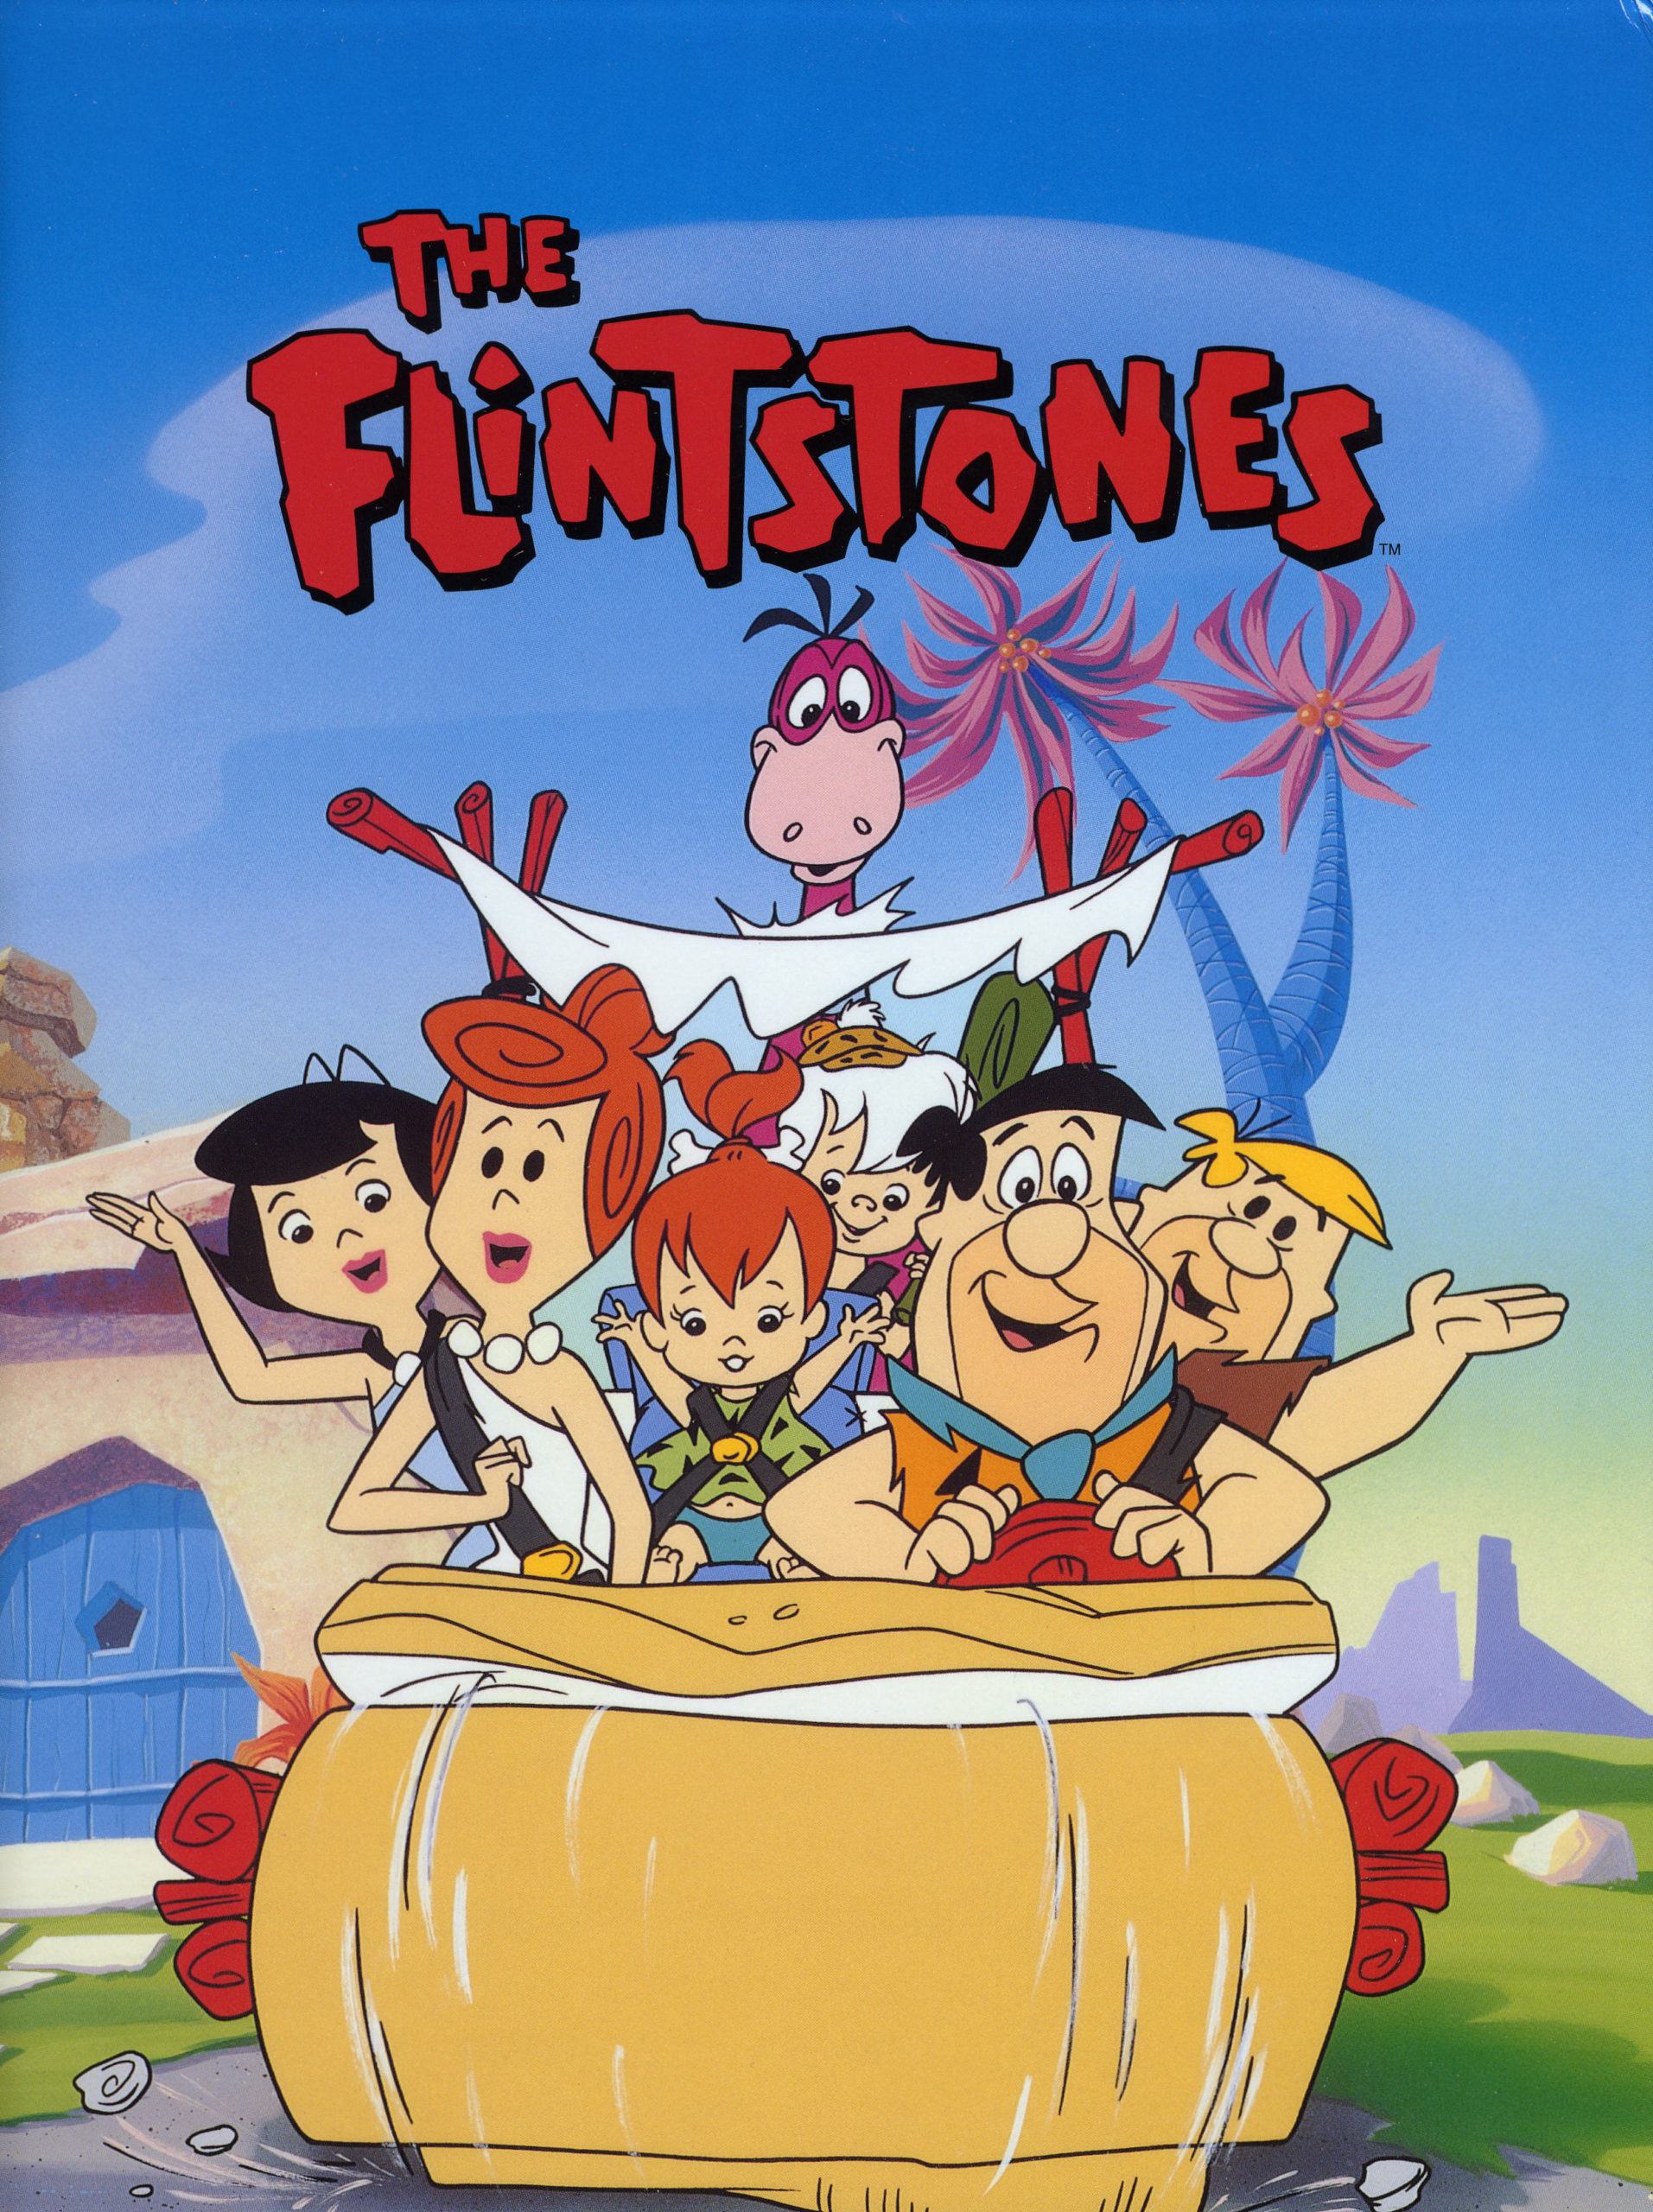 Flintstones Trailer Watch on HBO Max!